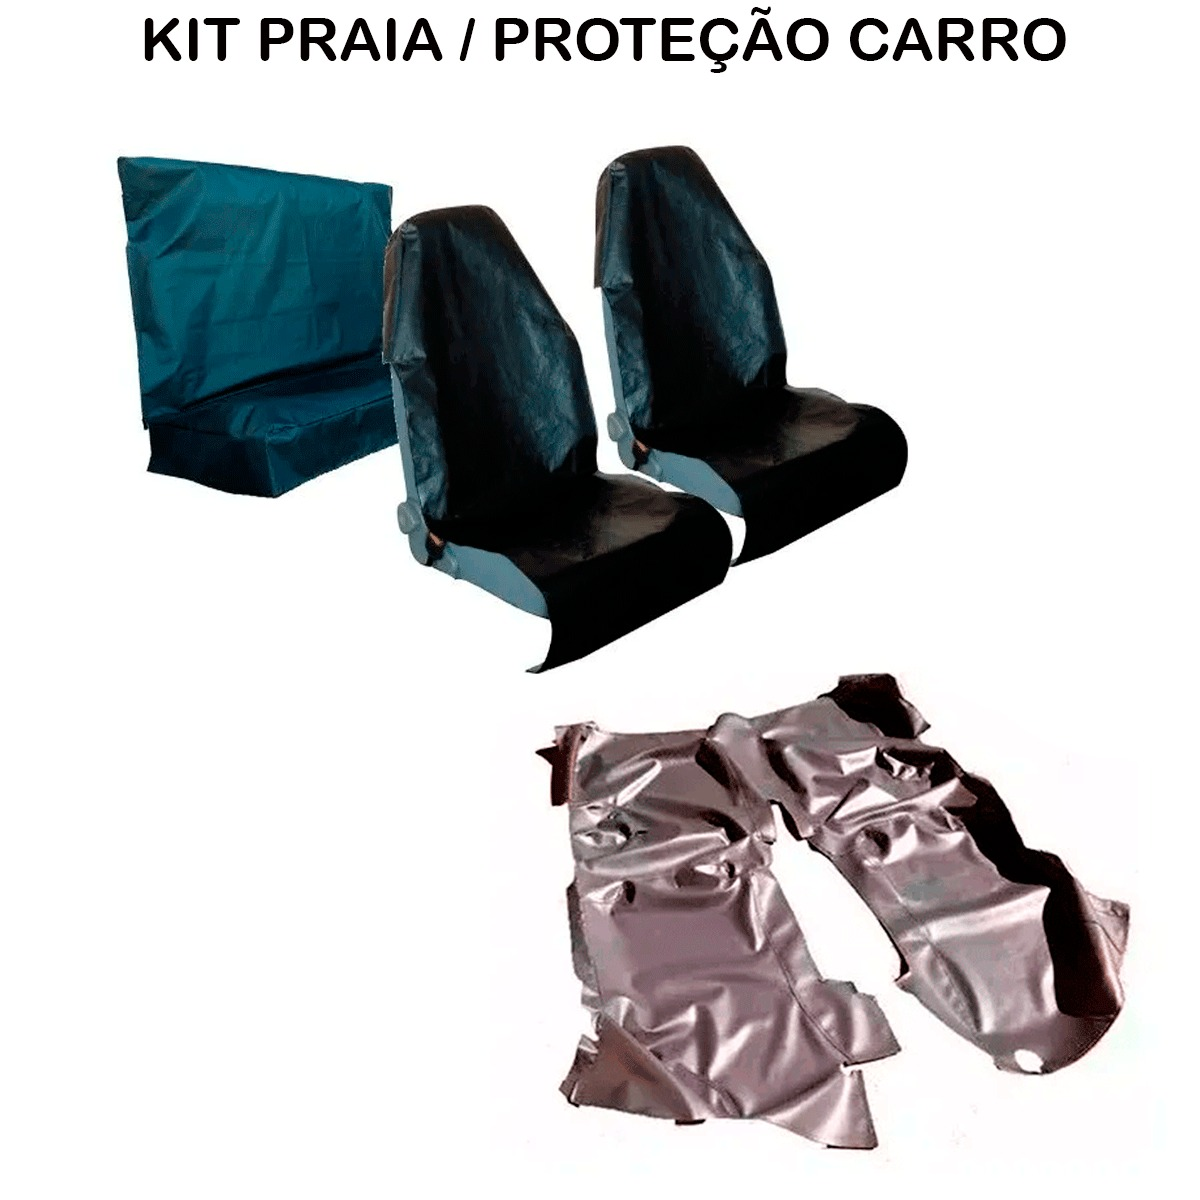 Tapete Em Vinil Chevrolet Opala Todos + Capa Banco Protecao Banco Areia Suor Academia